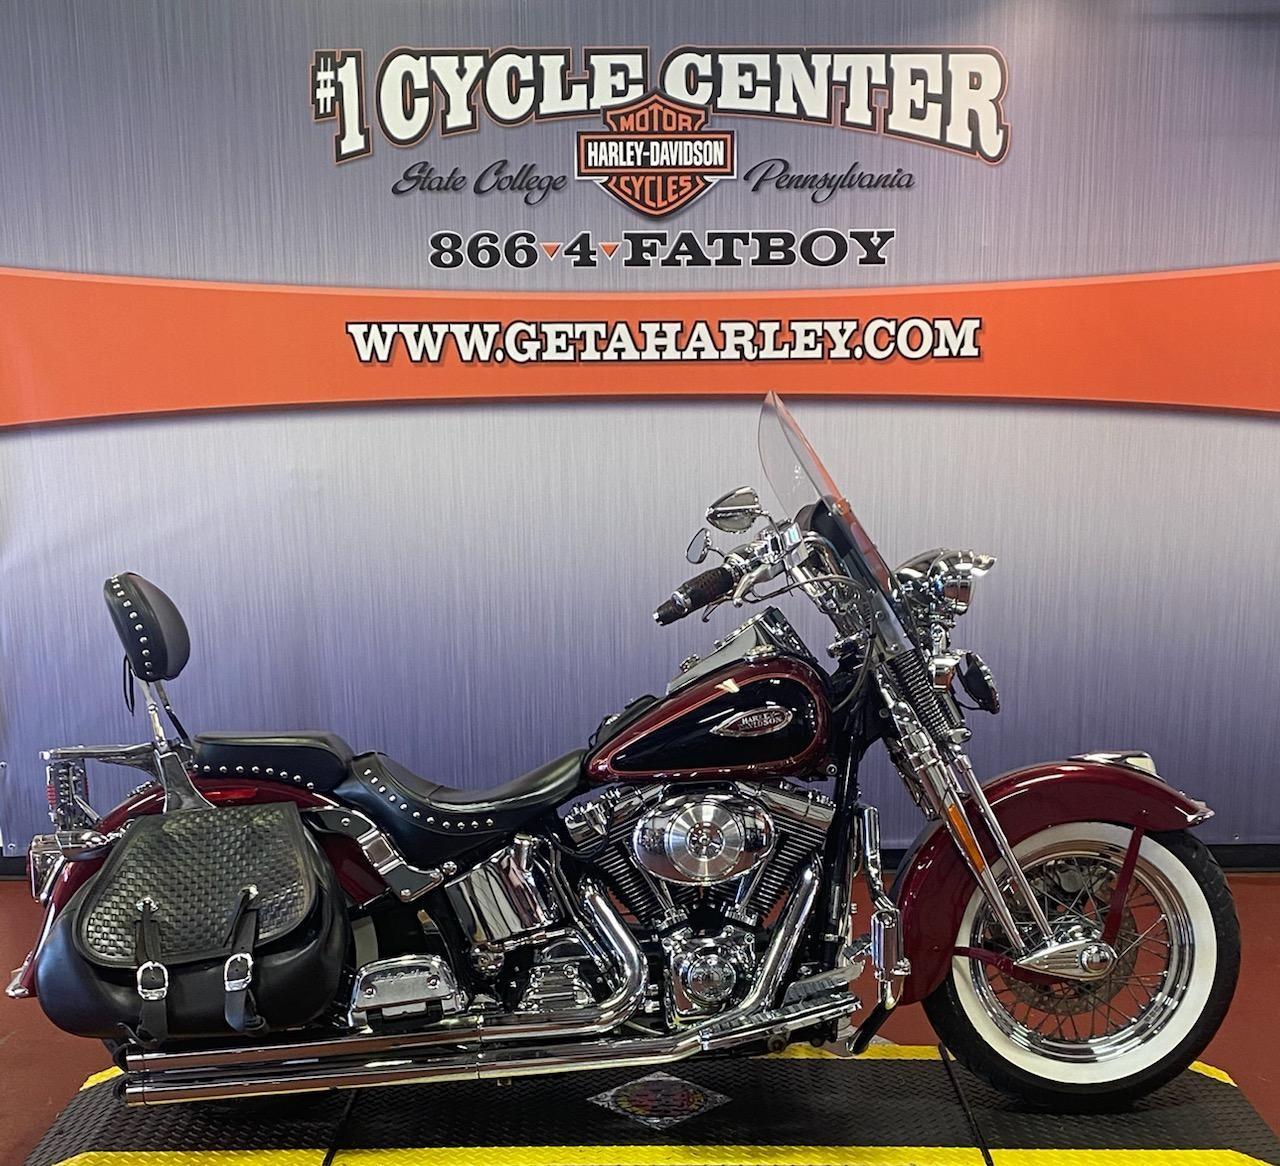 2001 Harley-Davidson FLSTS at #1 Cycle Center Harley-Davidson